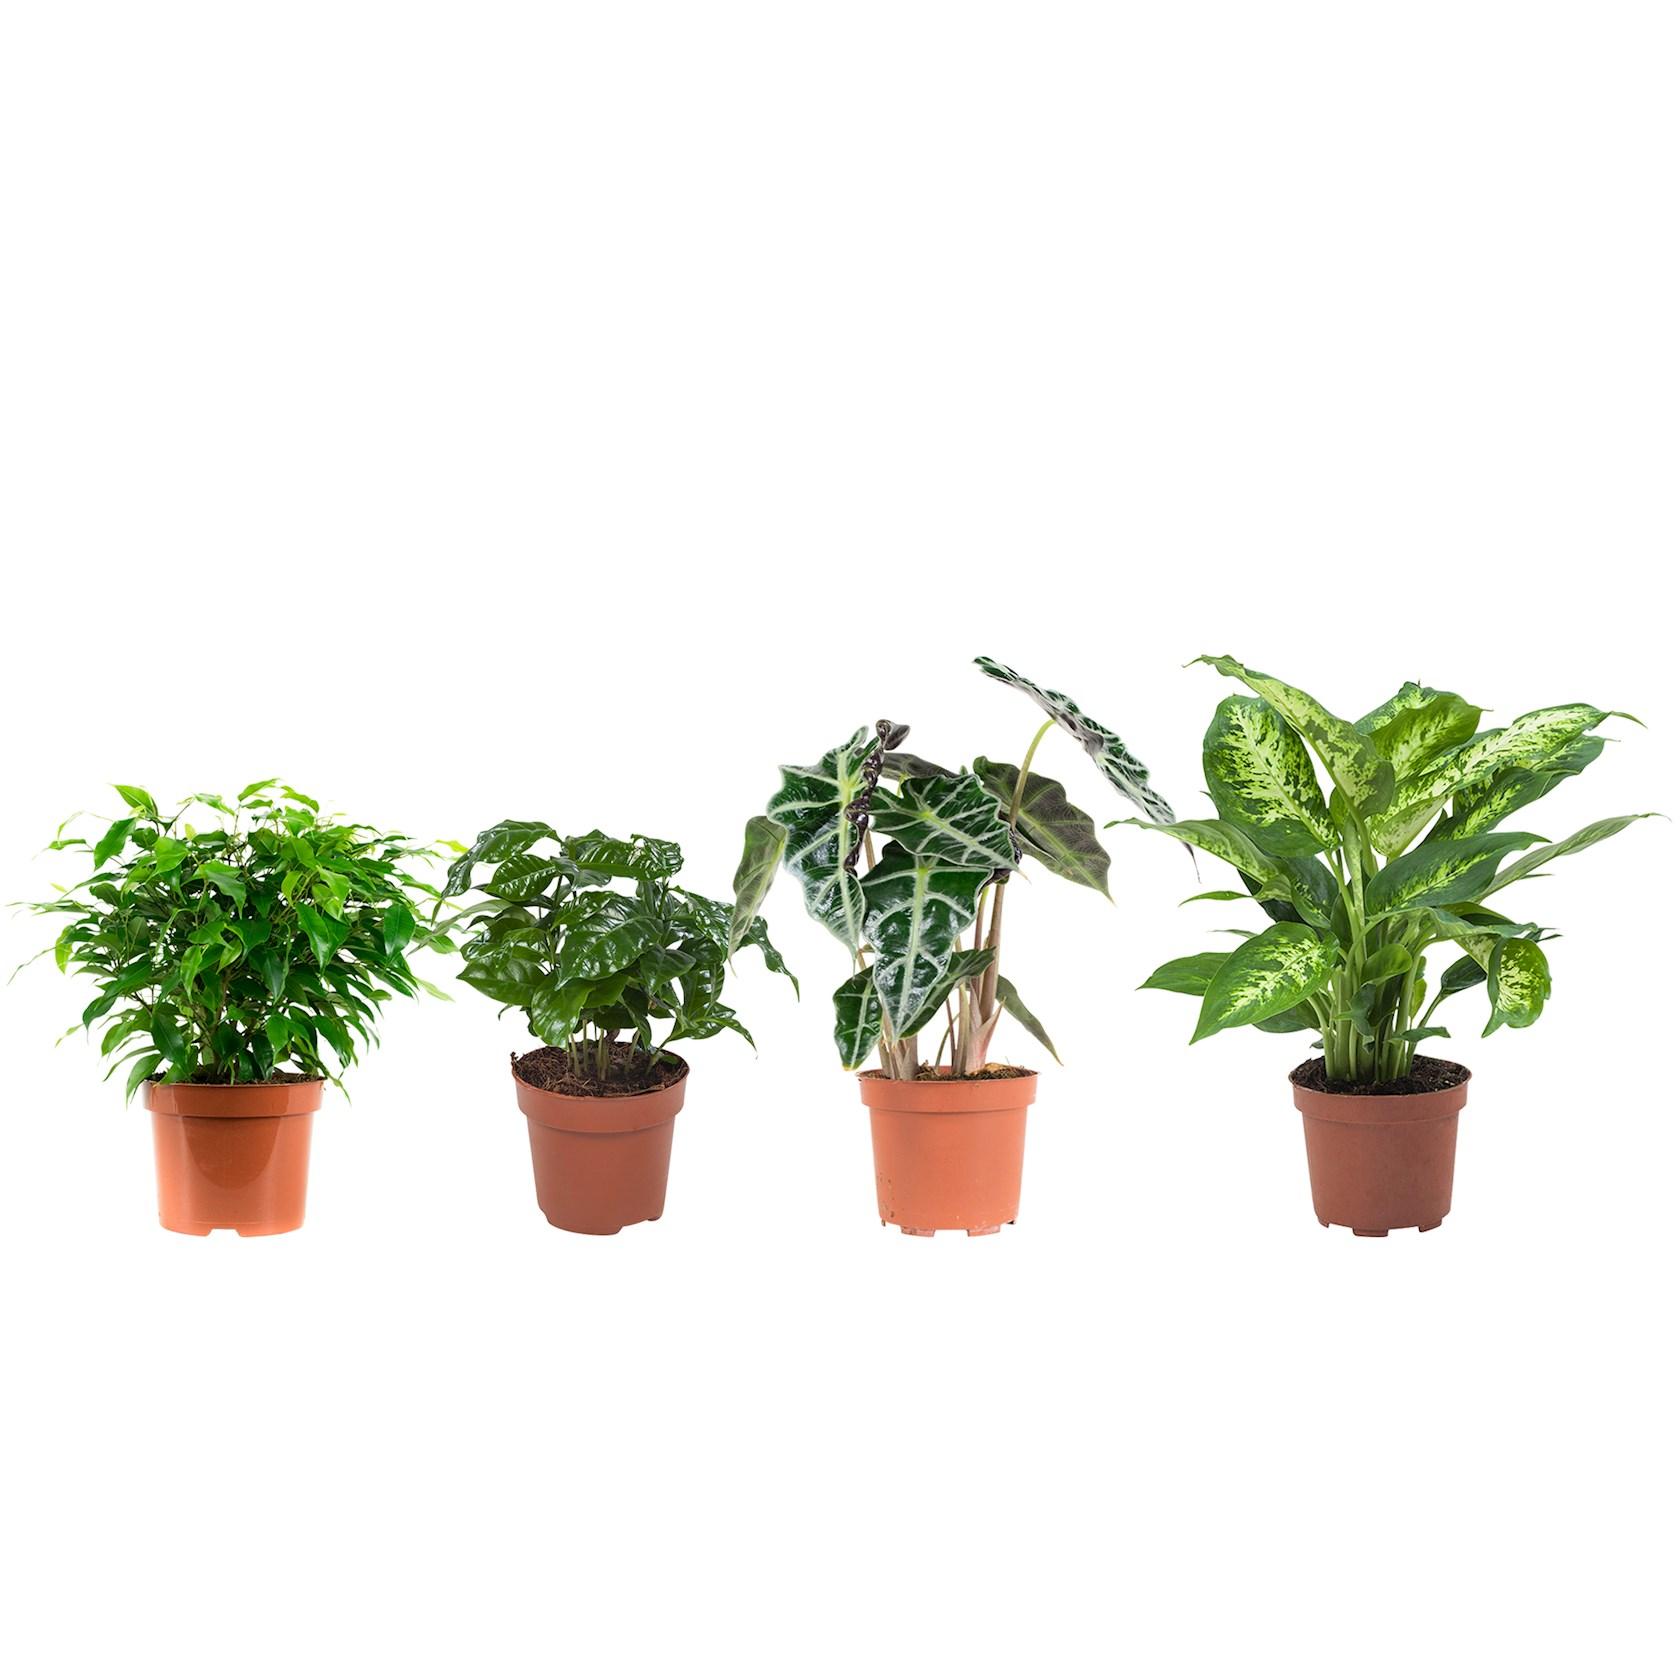 4 stuks Ficus (Ficus Green Kinky), Koffieplant (Coffea Arabica), Olifantsoor of Skeletplant (Alocasia Polly), Dieffenbachia (Dieffenbachia Compacta) - pot 12cm - hoogte 25cm